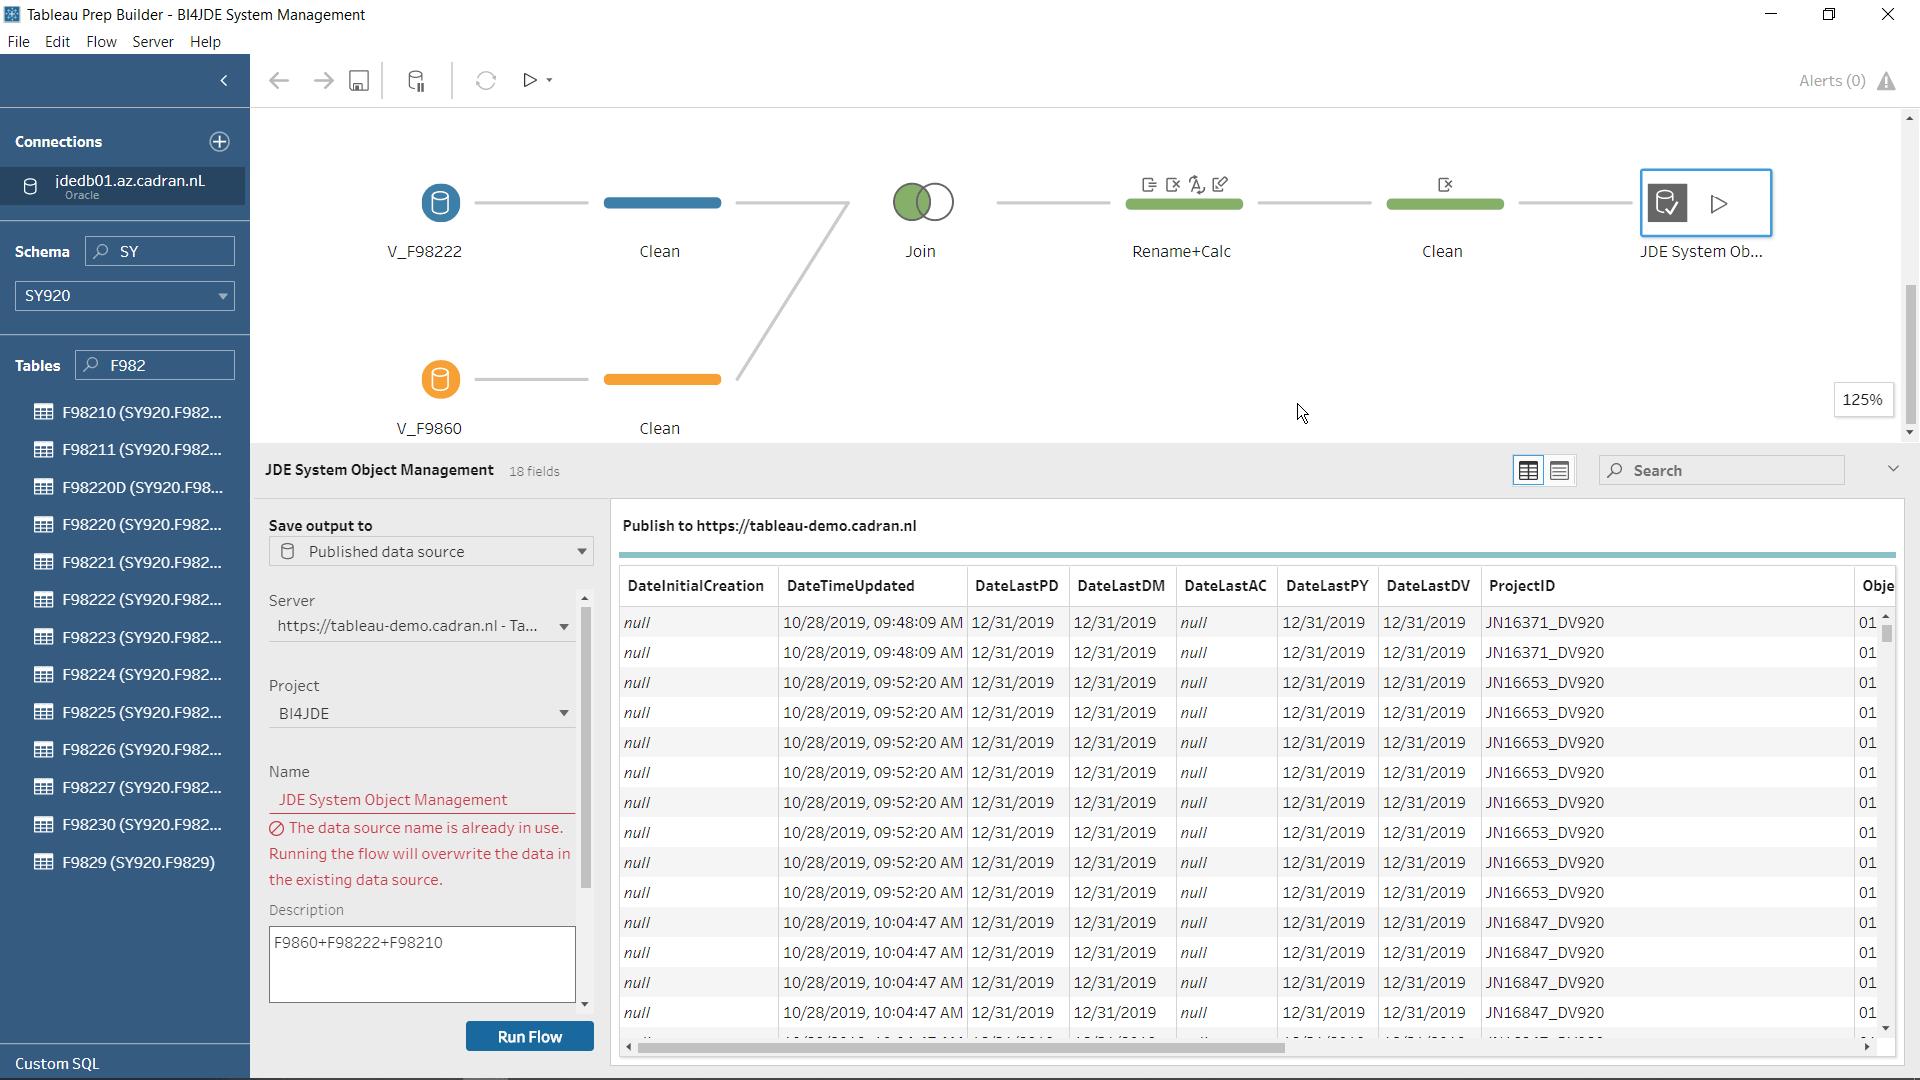 tableau jd edwards Object Management Workbench